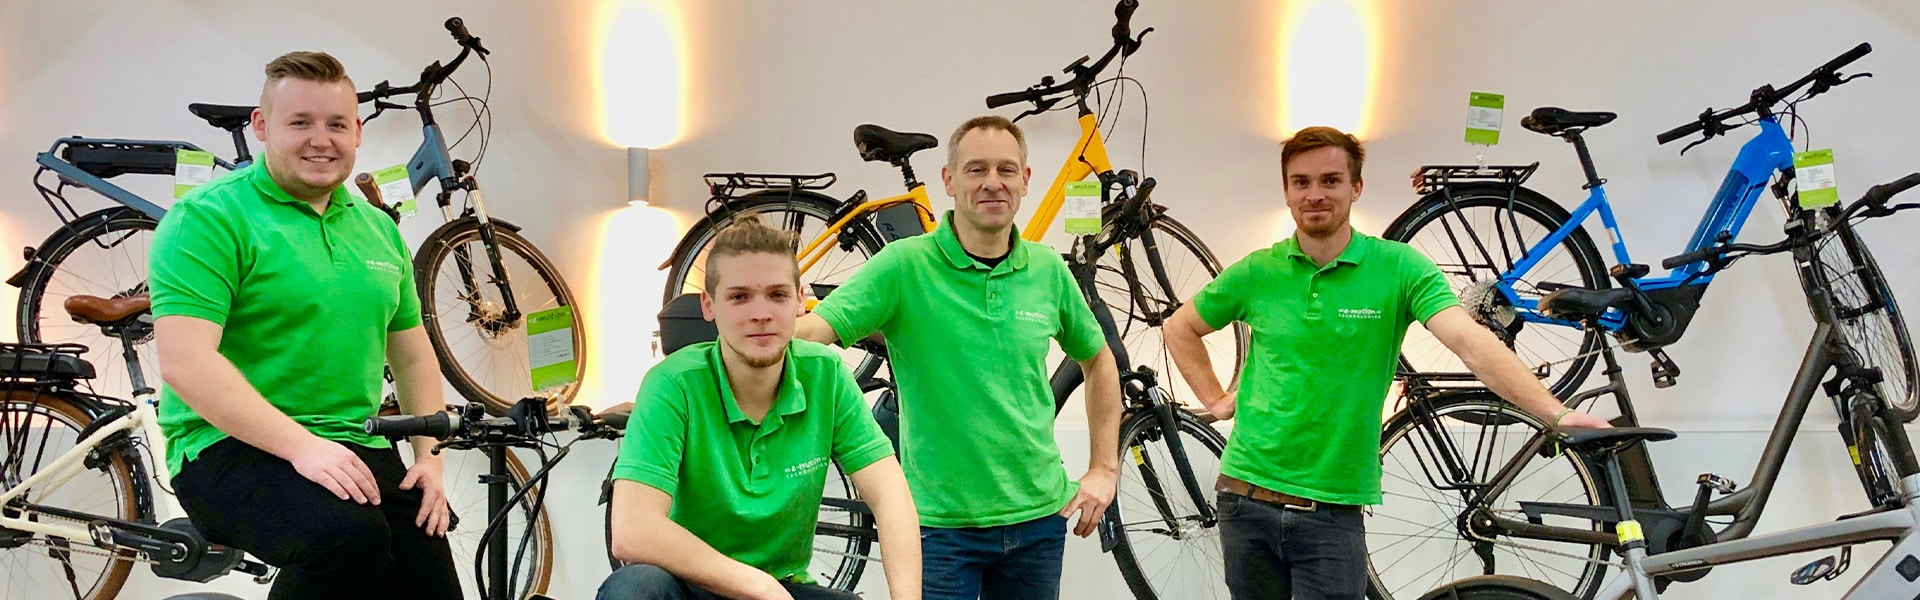 Das Team der e-motion e-Bike Welt Braunschweig